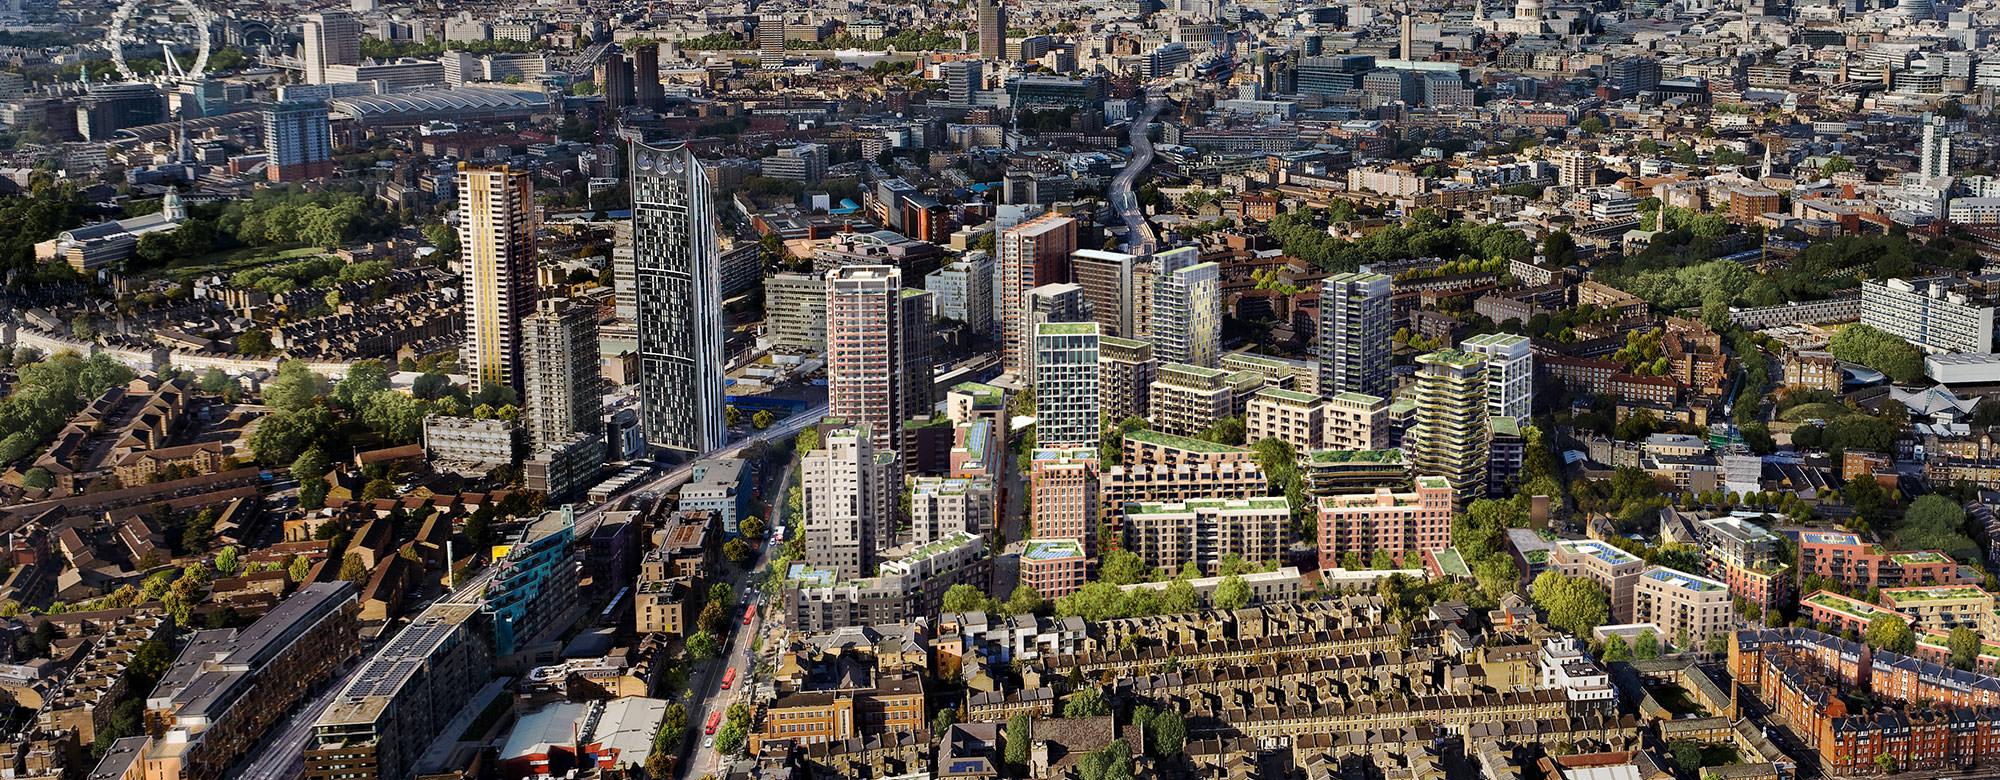 urban-master-planning-banner-v2